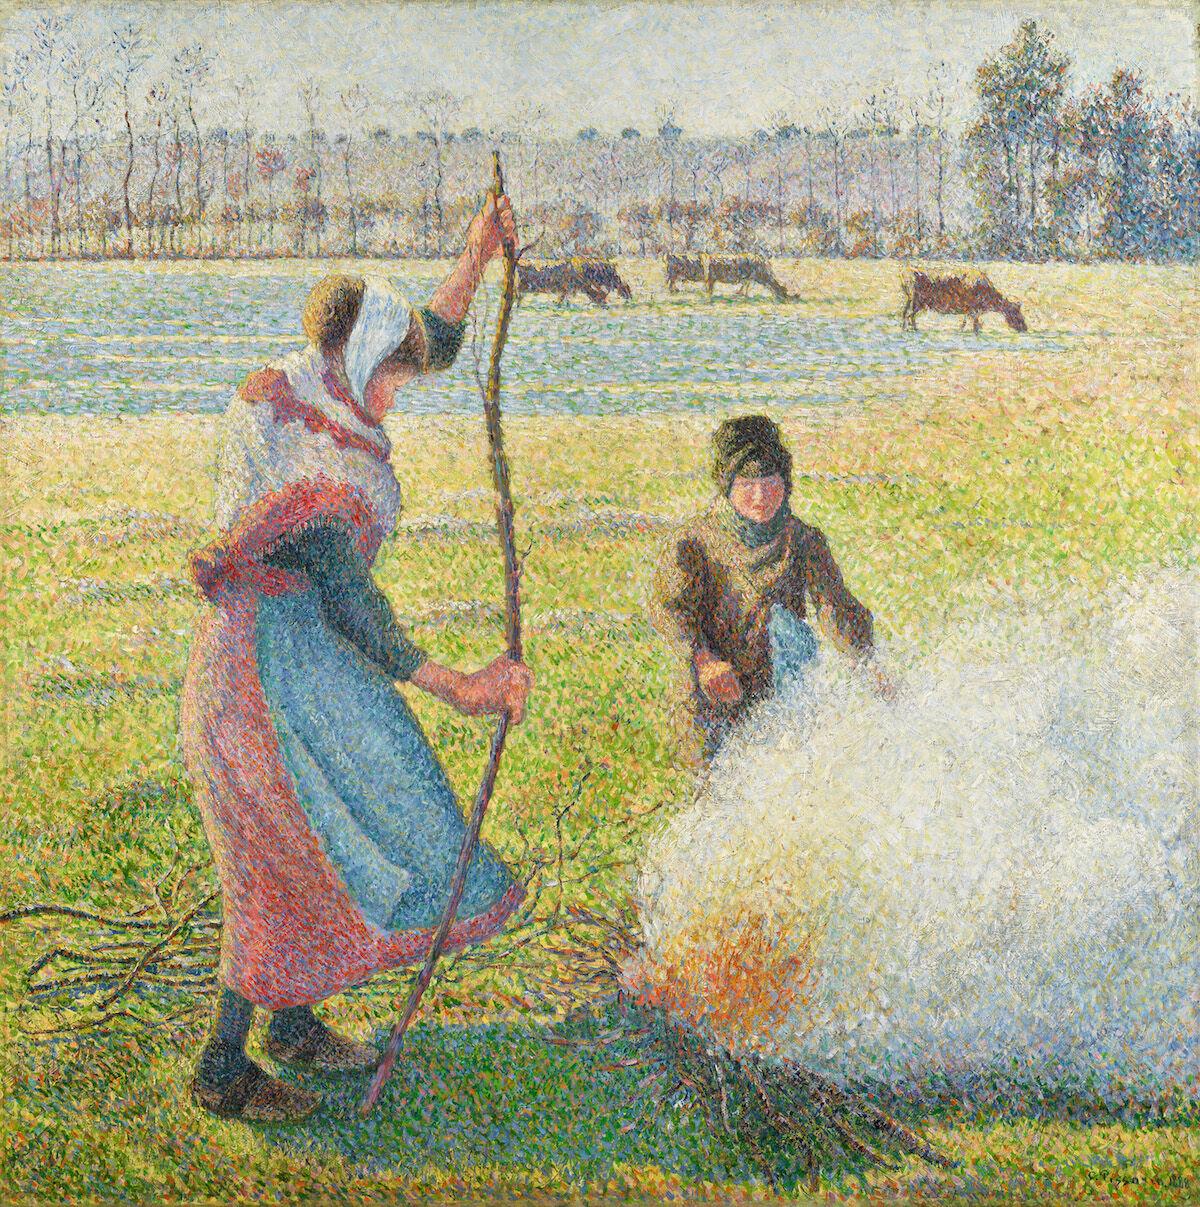 Camille Pissarro, Gelée blanche, jeune paysanne faisant du feu, 1888. Est. £8 million–12 million ($10.4 million–15.6 million). Courtesy Sotheby's.